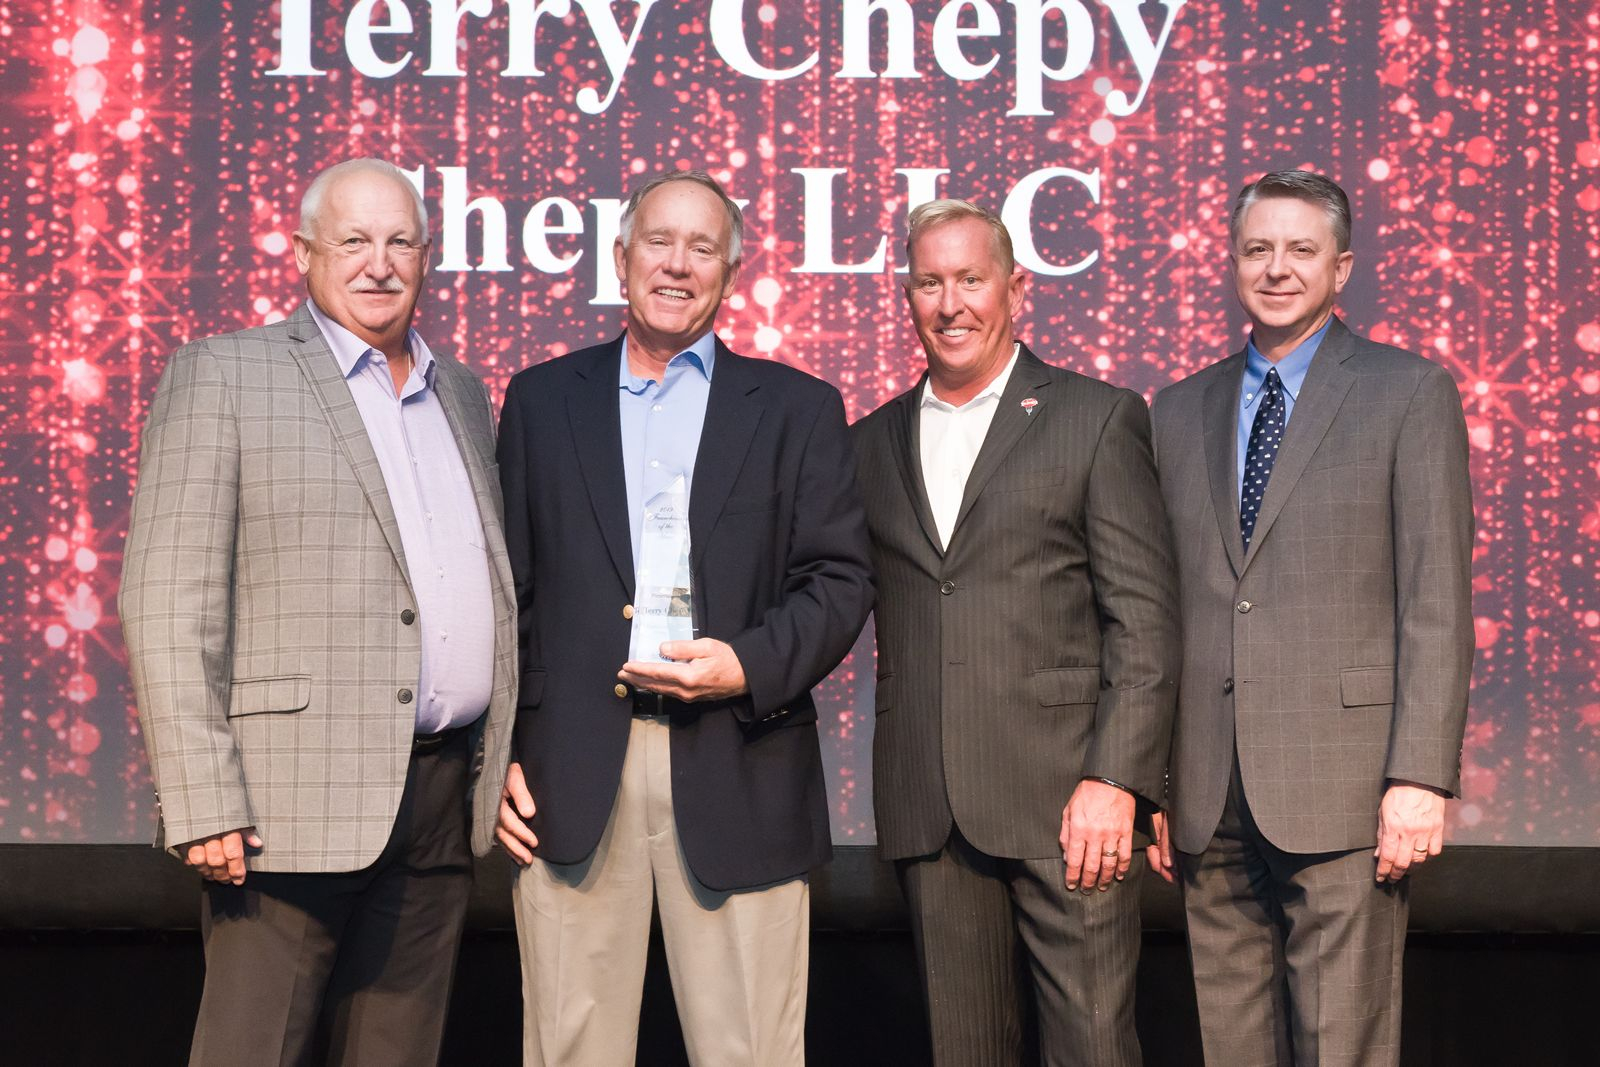 Doug Bostick, Senior VP of Operations & Franchise Development; Terry Chepy, Franchisee of the Year; Carl Howard, Fazoli's CEO; Rodney Lee, Fazoli's CFO.